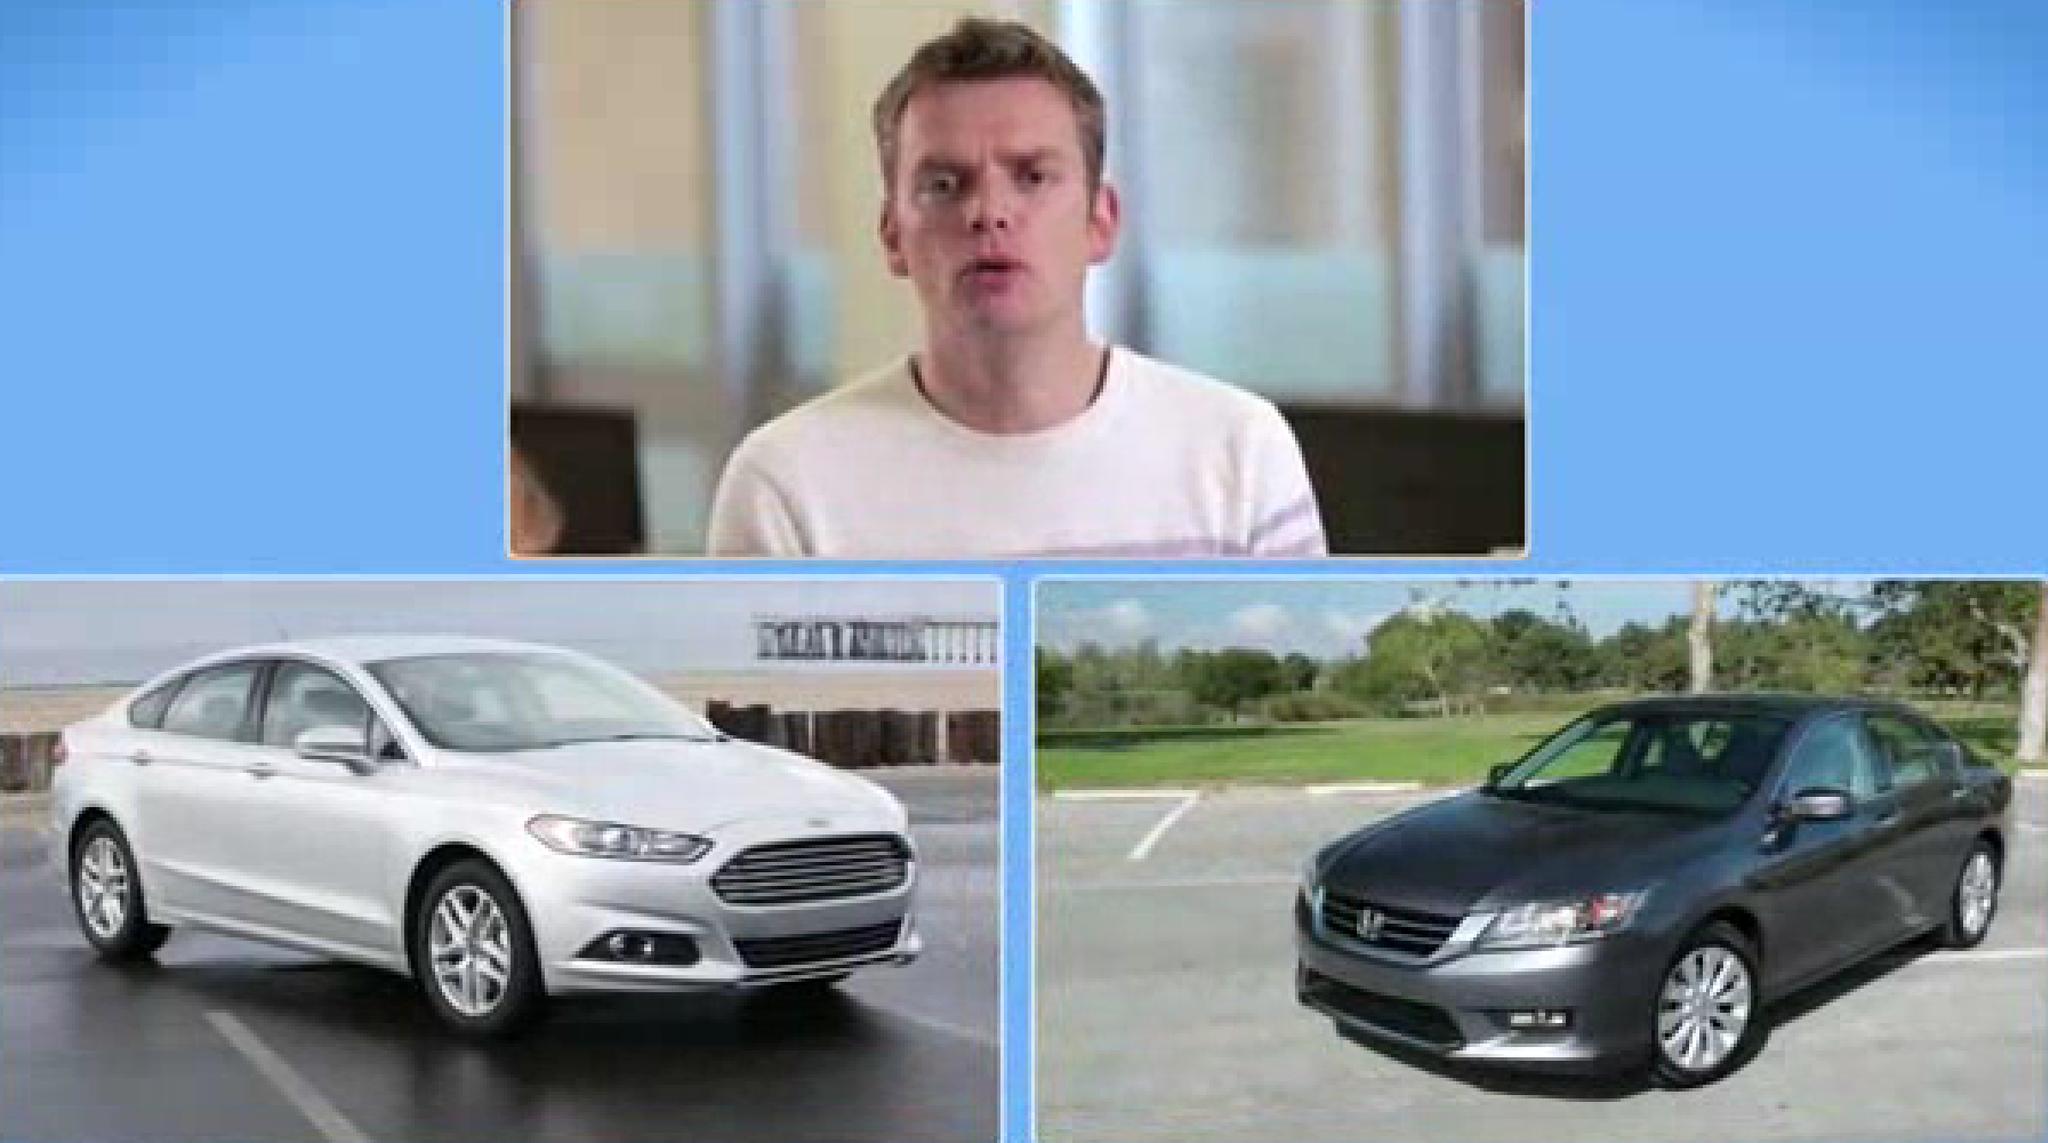 Honda Accord Vs Ford Fusion >> Honda Accord vs. Ford Fusion, two sedans face off - Chicago Tribune